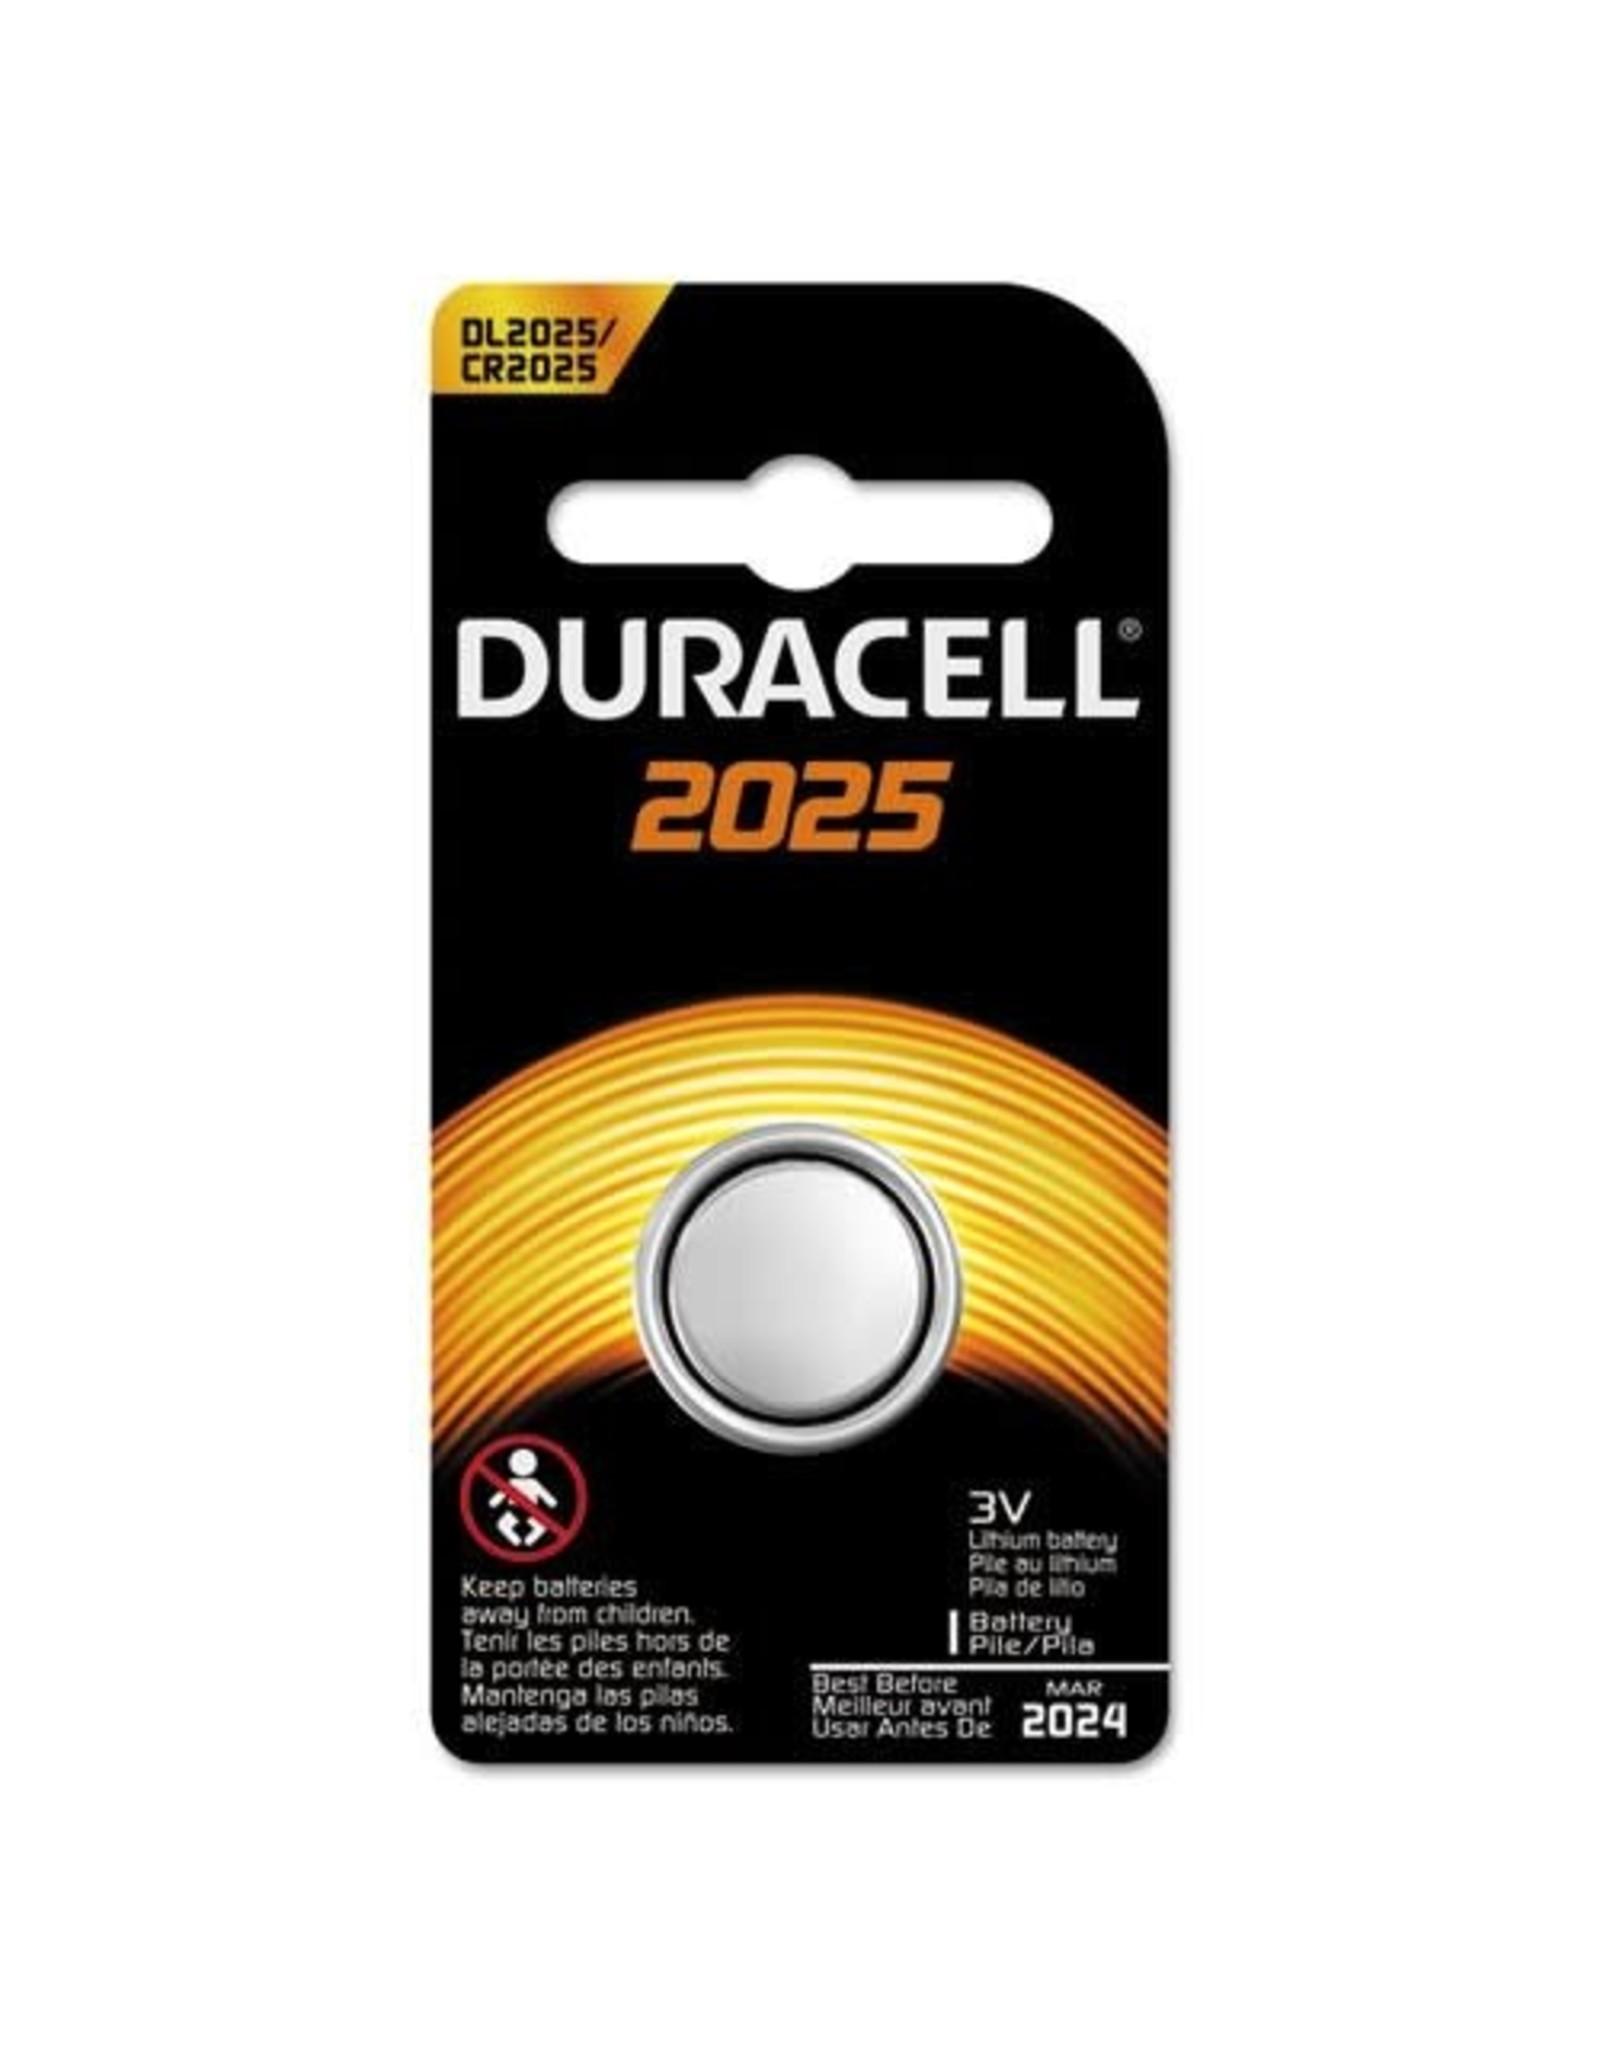 Duracell Duracell DL2025 3V Lithium Battery 1 Pack